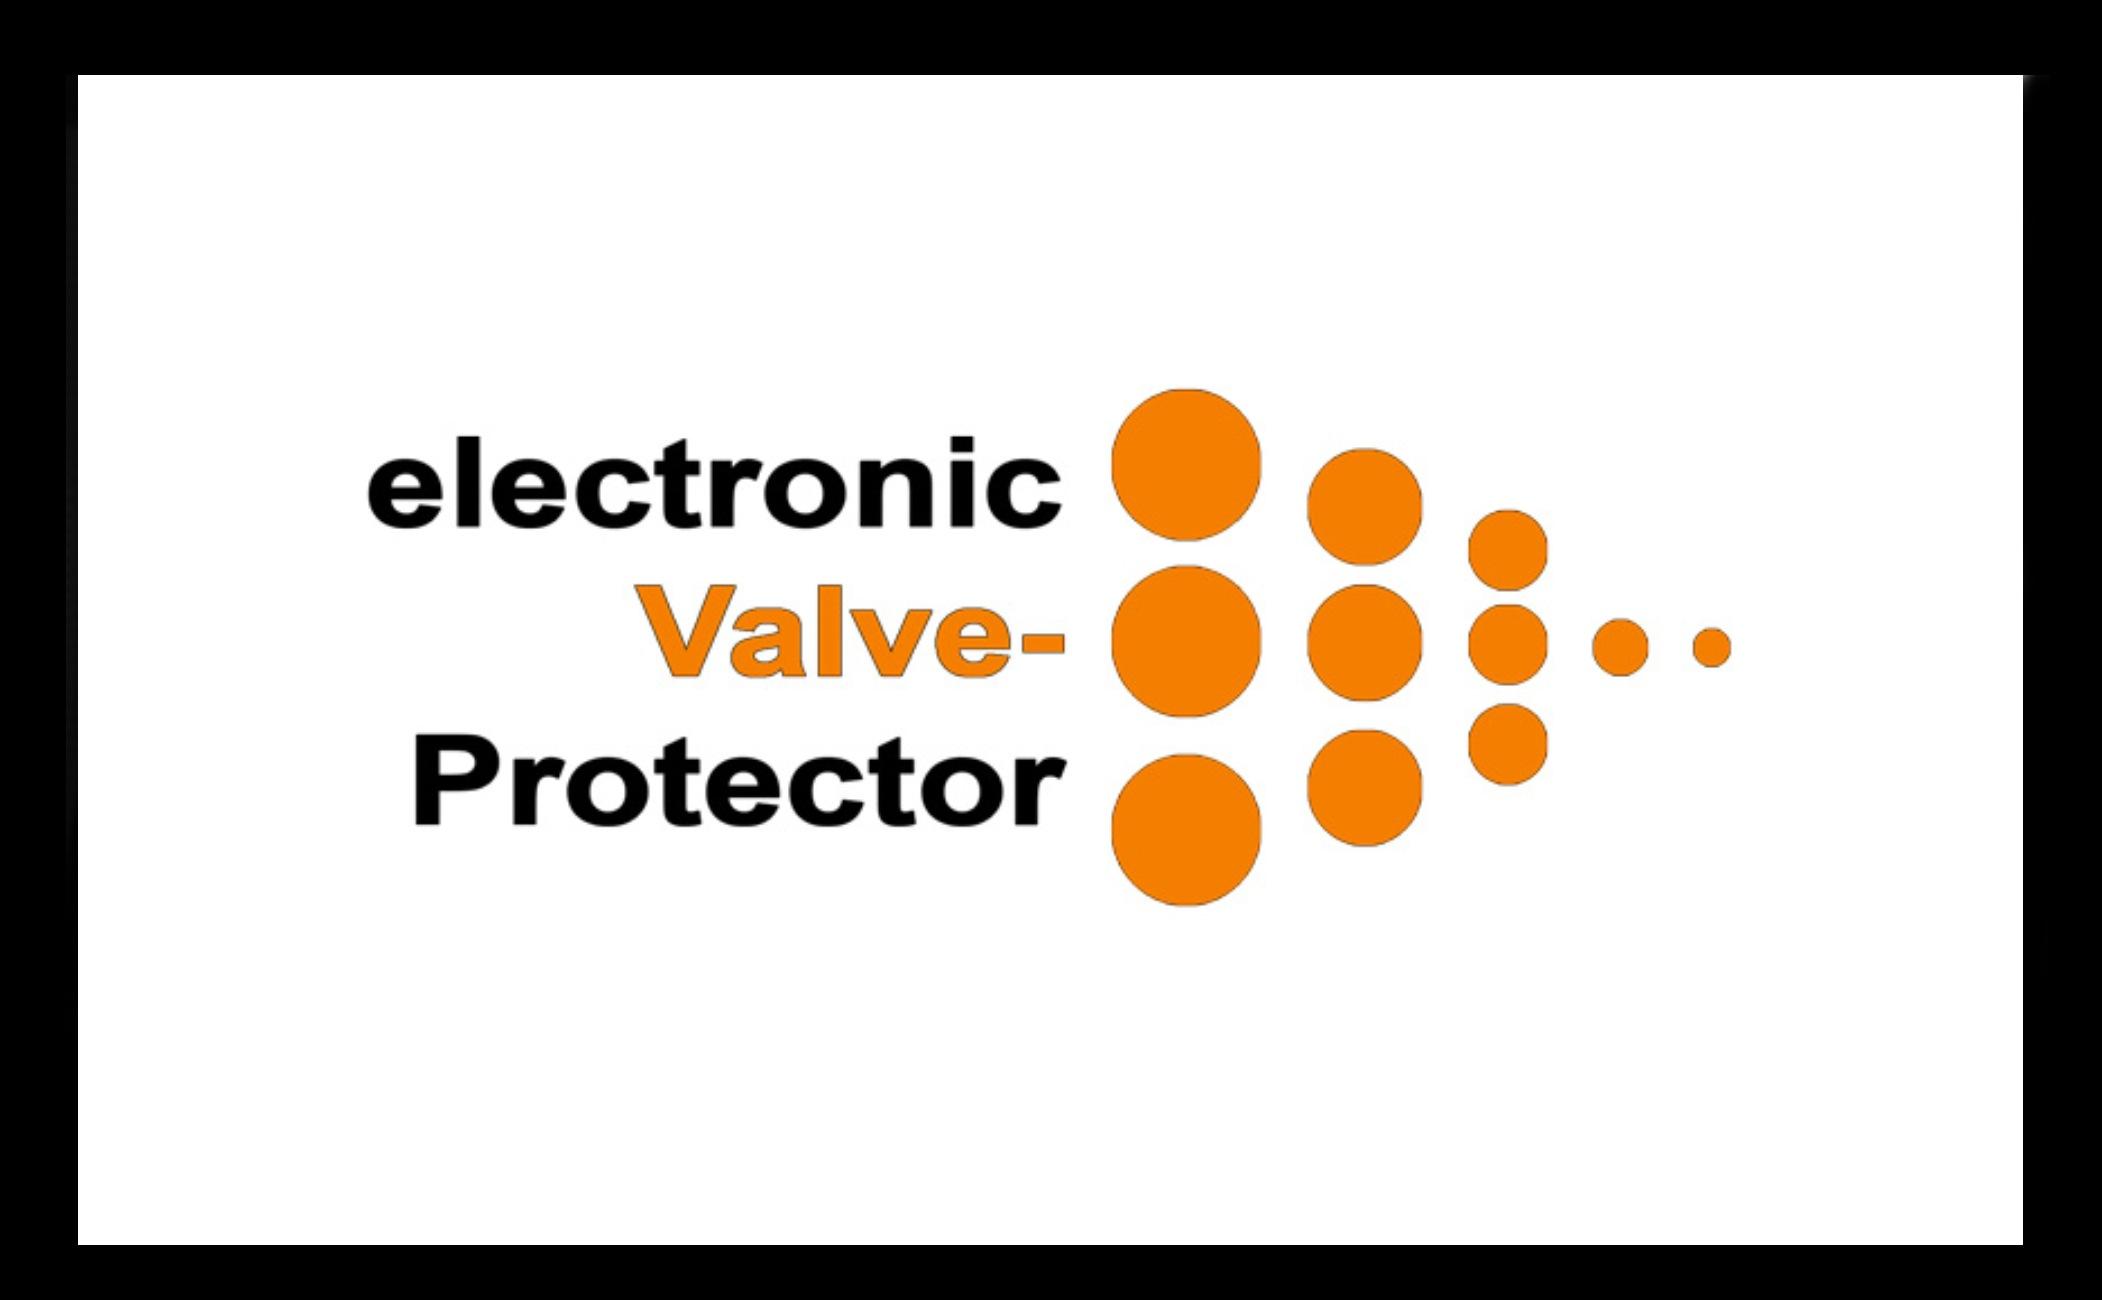 Valve - Protector